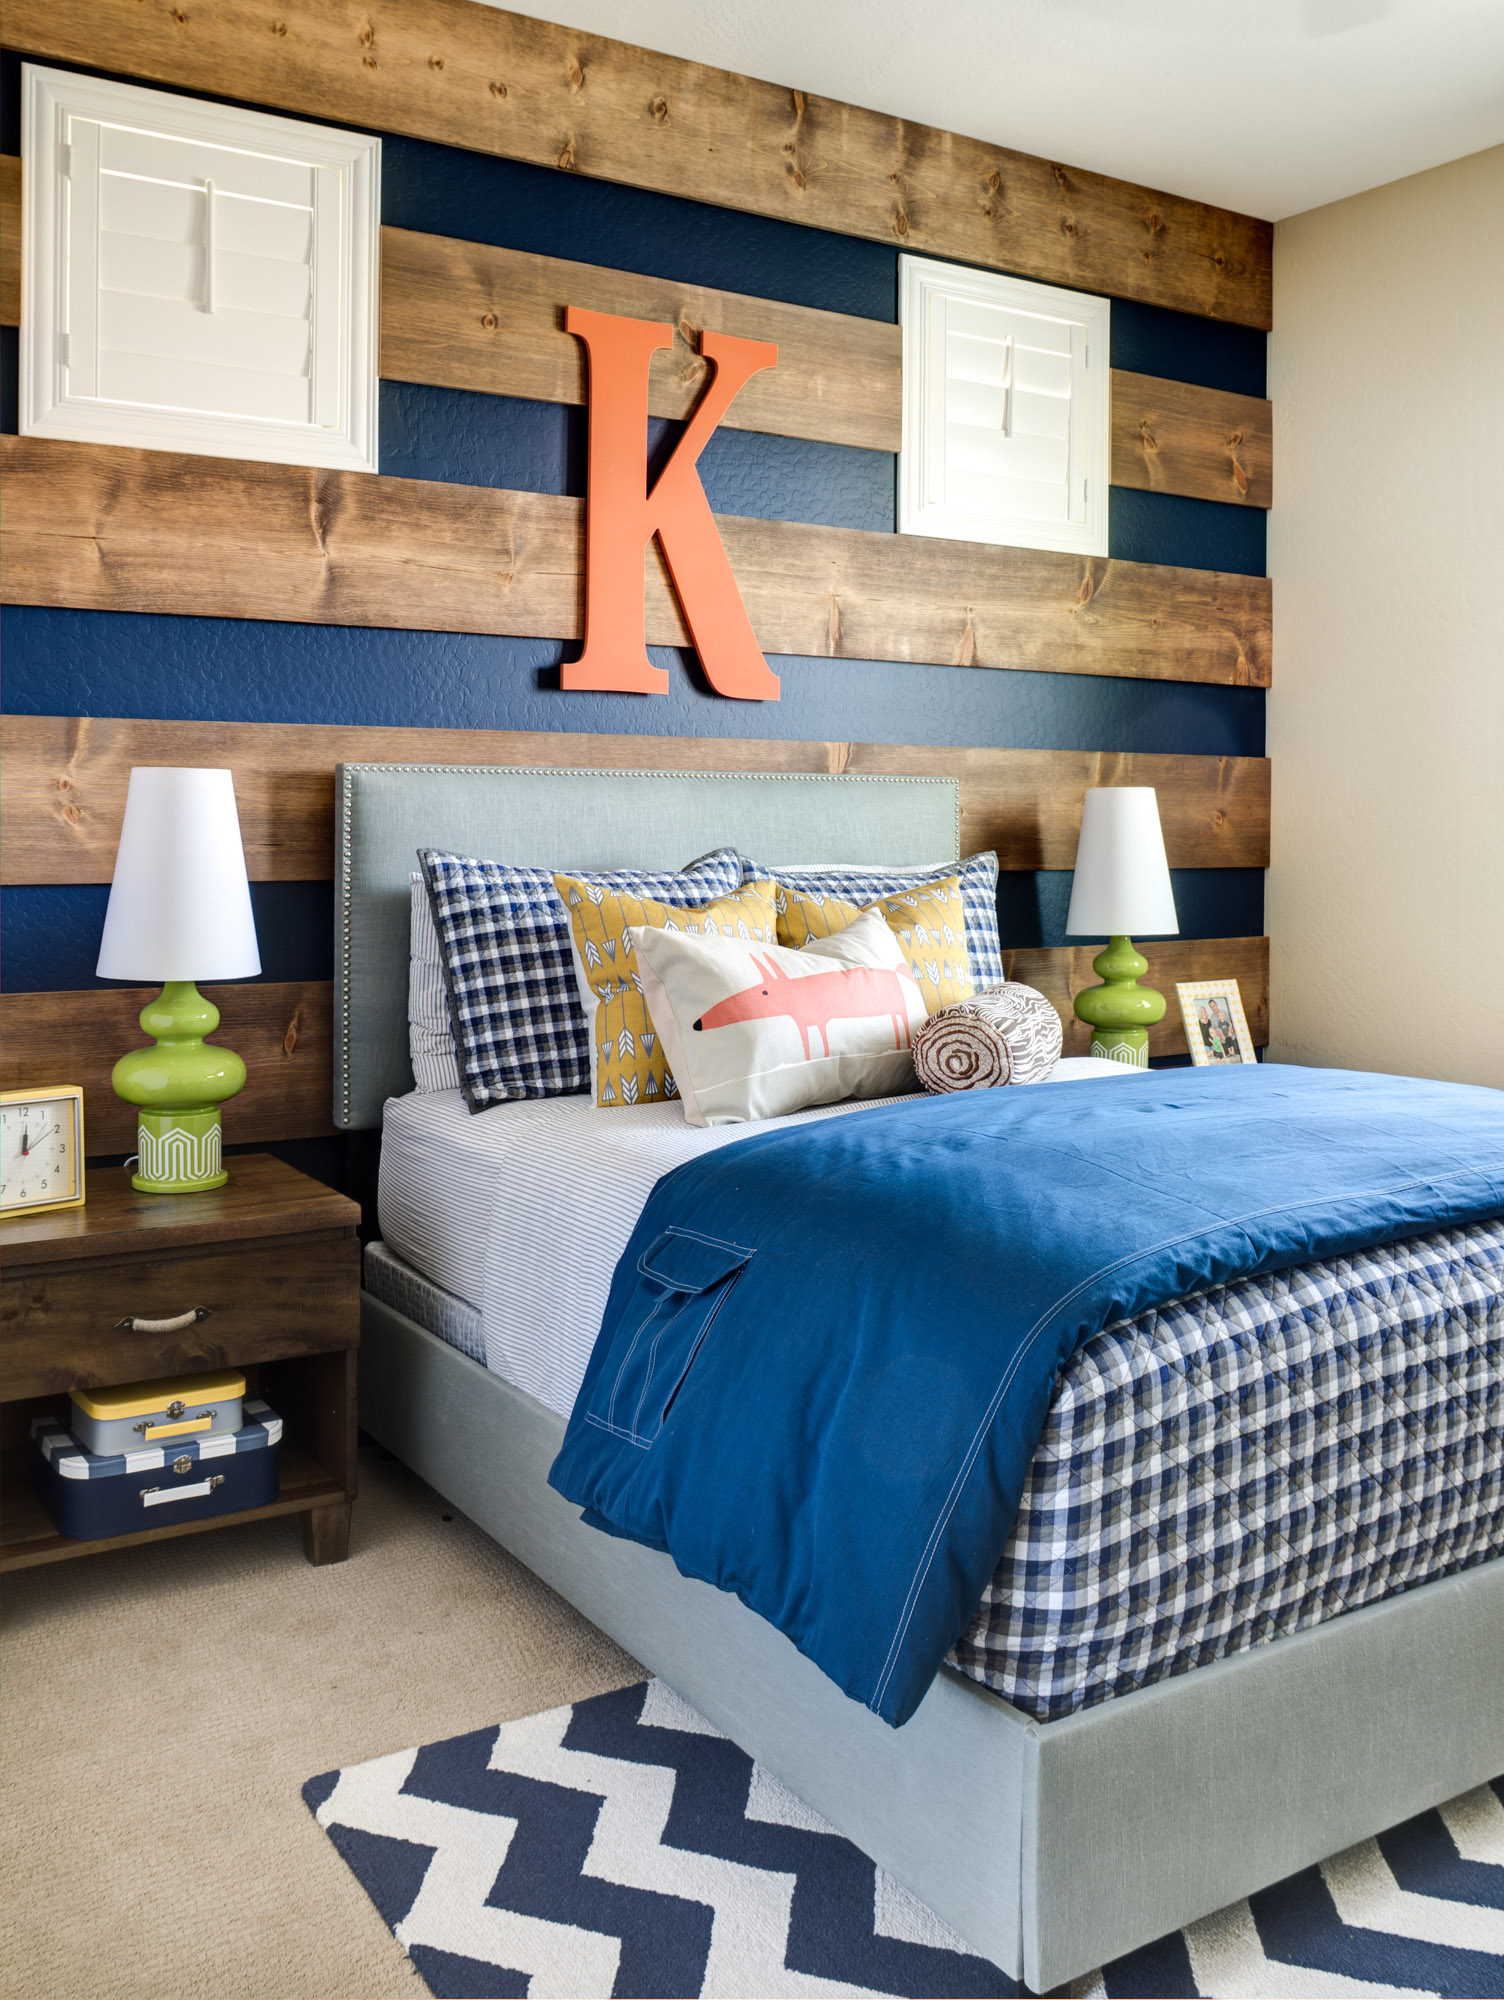 Imposing Big Boy Room Bedroom Ideas Small Rooms Boys Addicted Diy Boys Bedroom Ideas houzz-03 Boys Bedroom Ideas